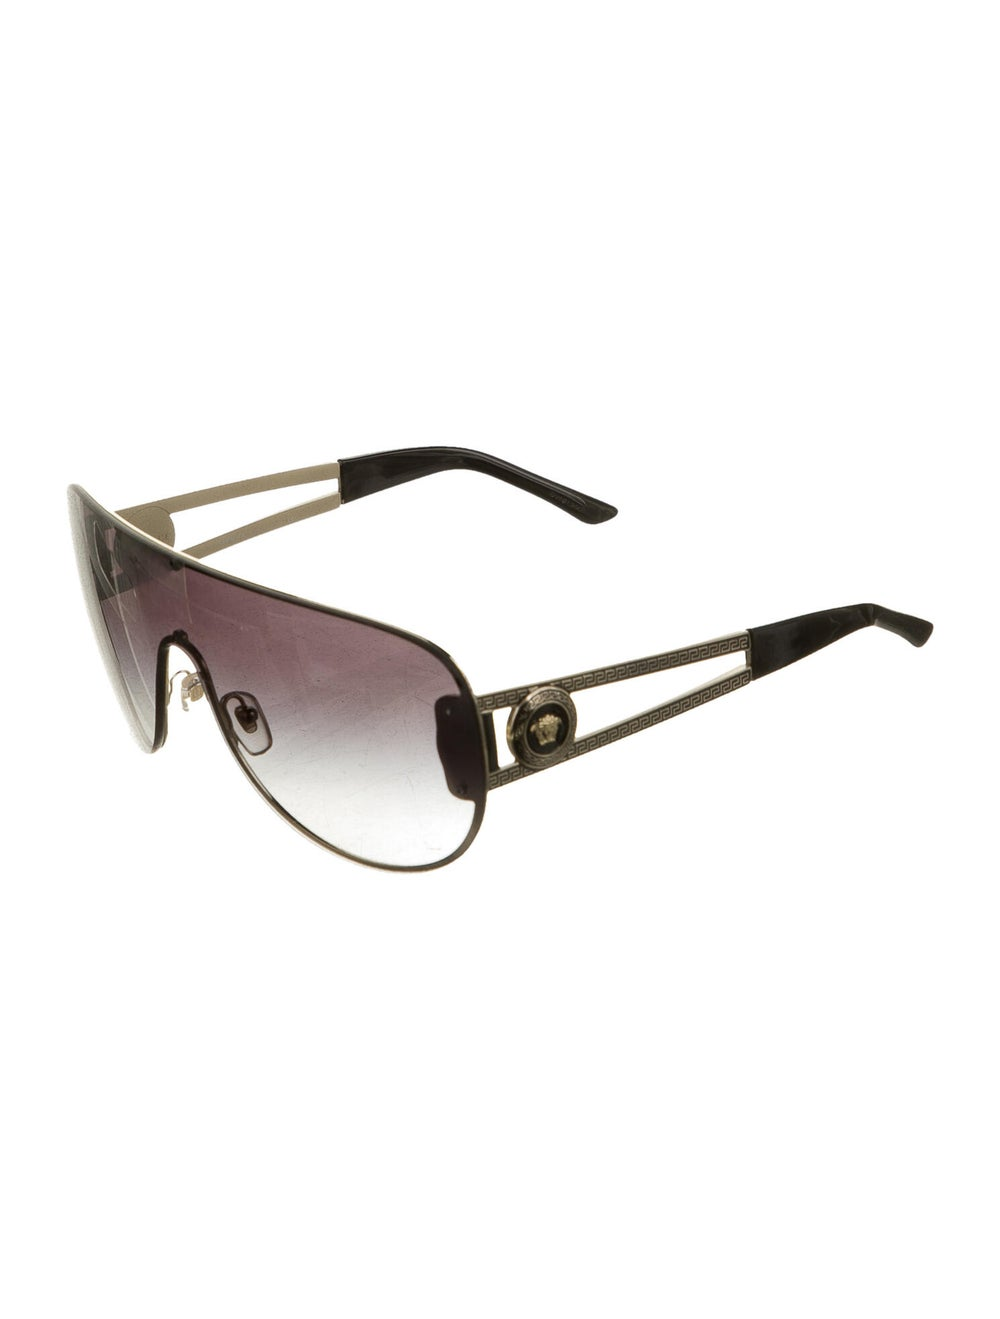 Versace Medusa Aviator Sunglasses gold - image 2